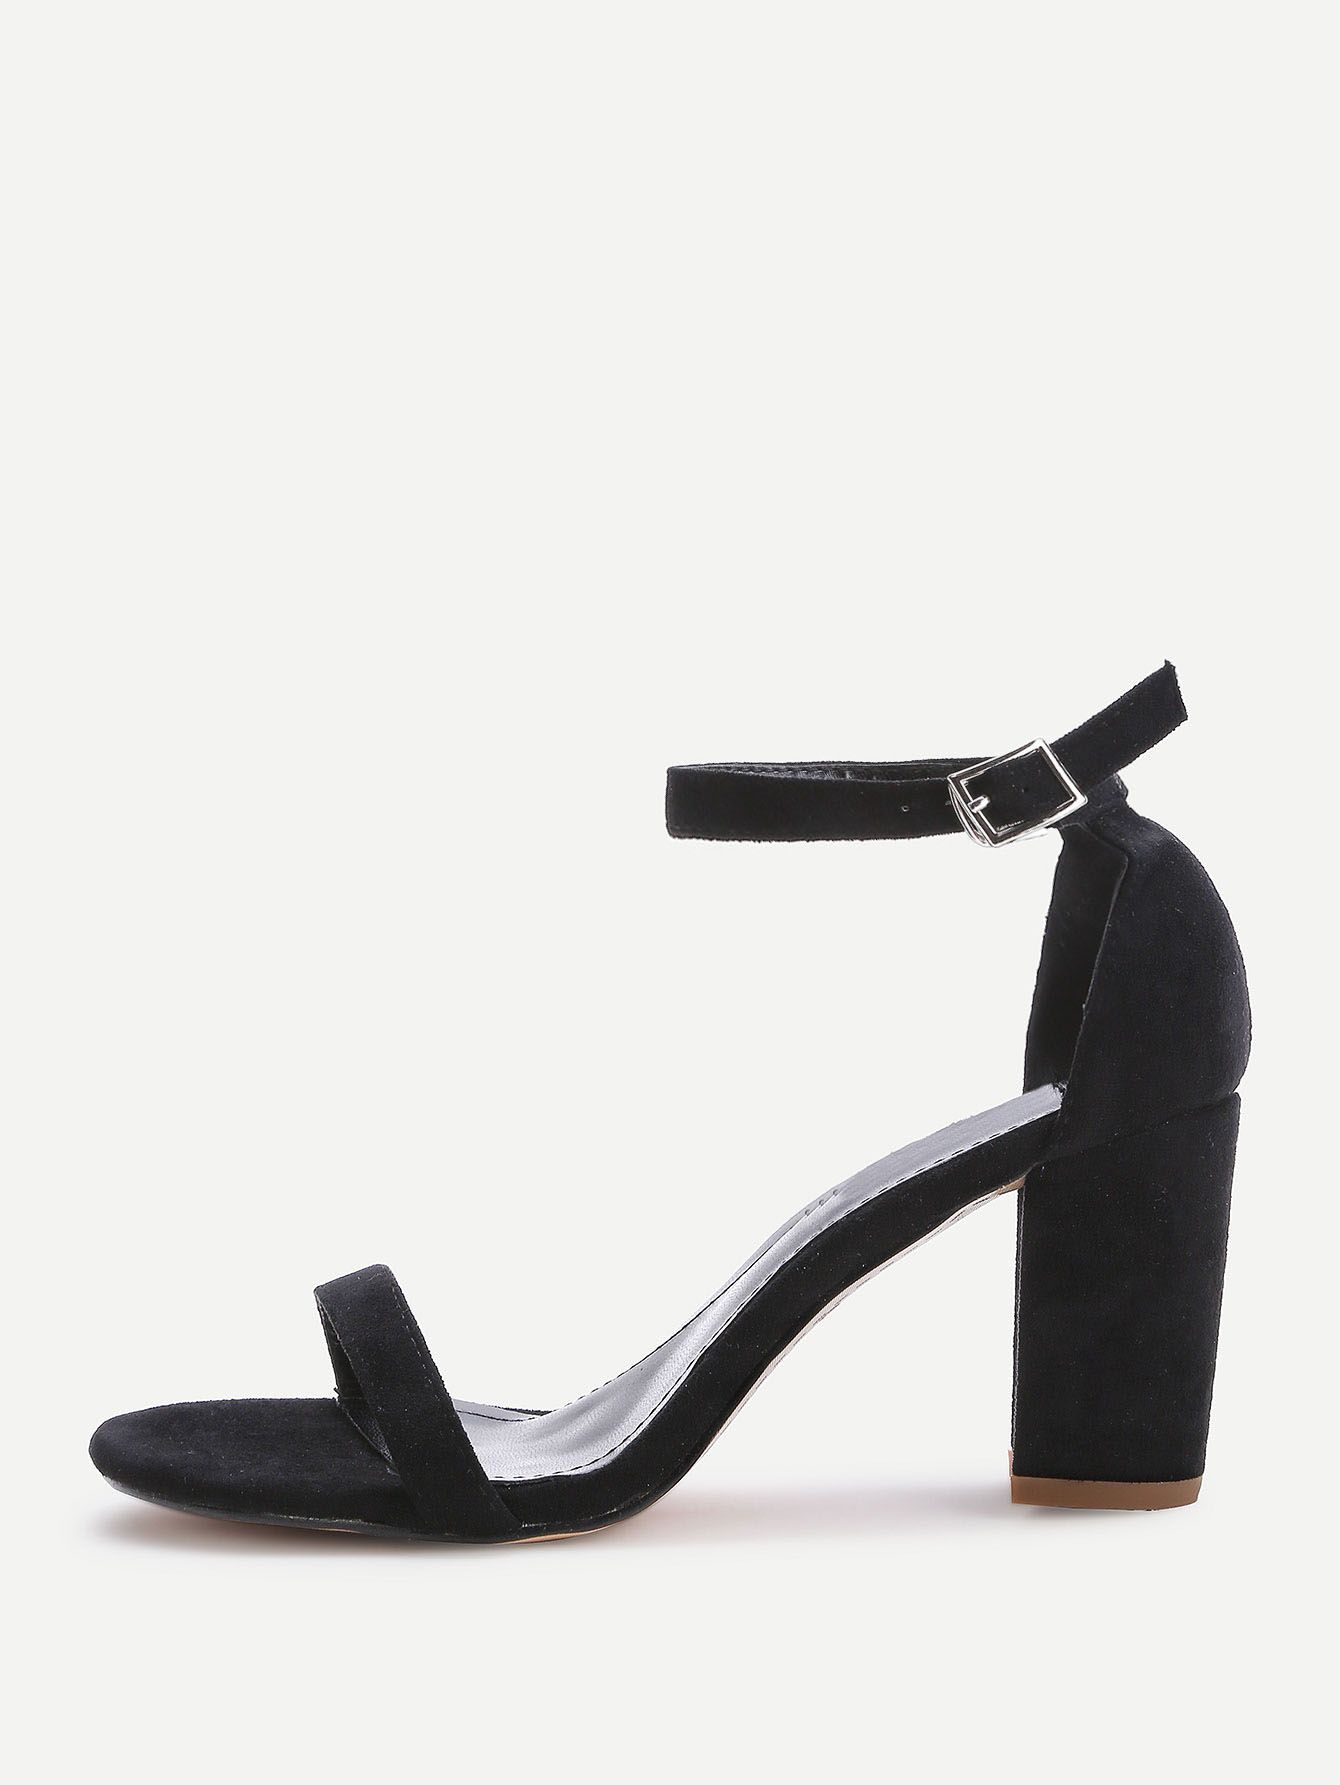 335c16c9214 Shop Two Part Block Heeled Sandals online. SheIn offers Two Part Block  Heeled Sandals   more to fit your fashionable needs.